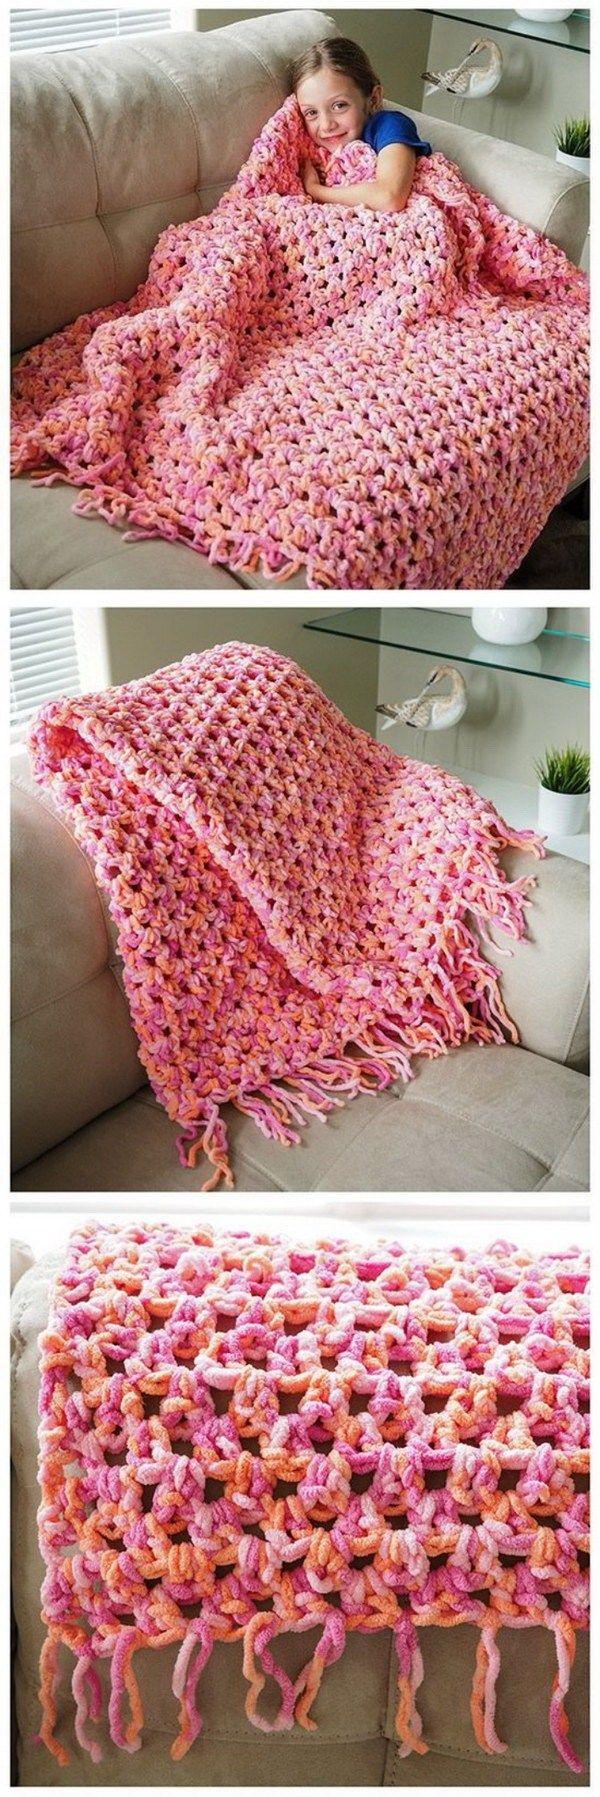 35+ Free Crochet Blanket Patterns & Tutorials | Manta, Puntos ...